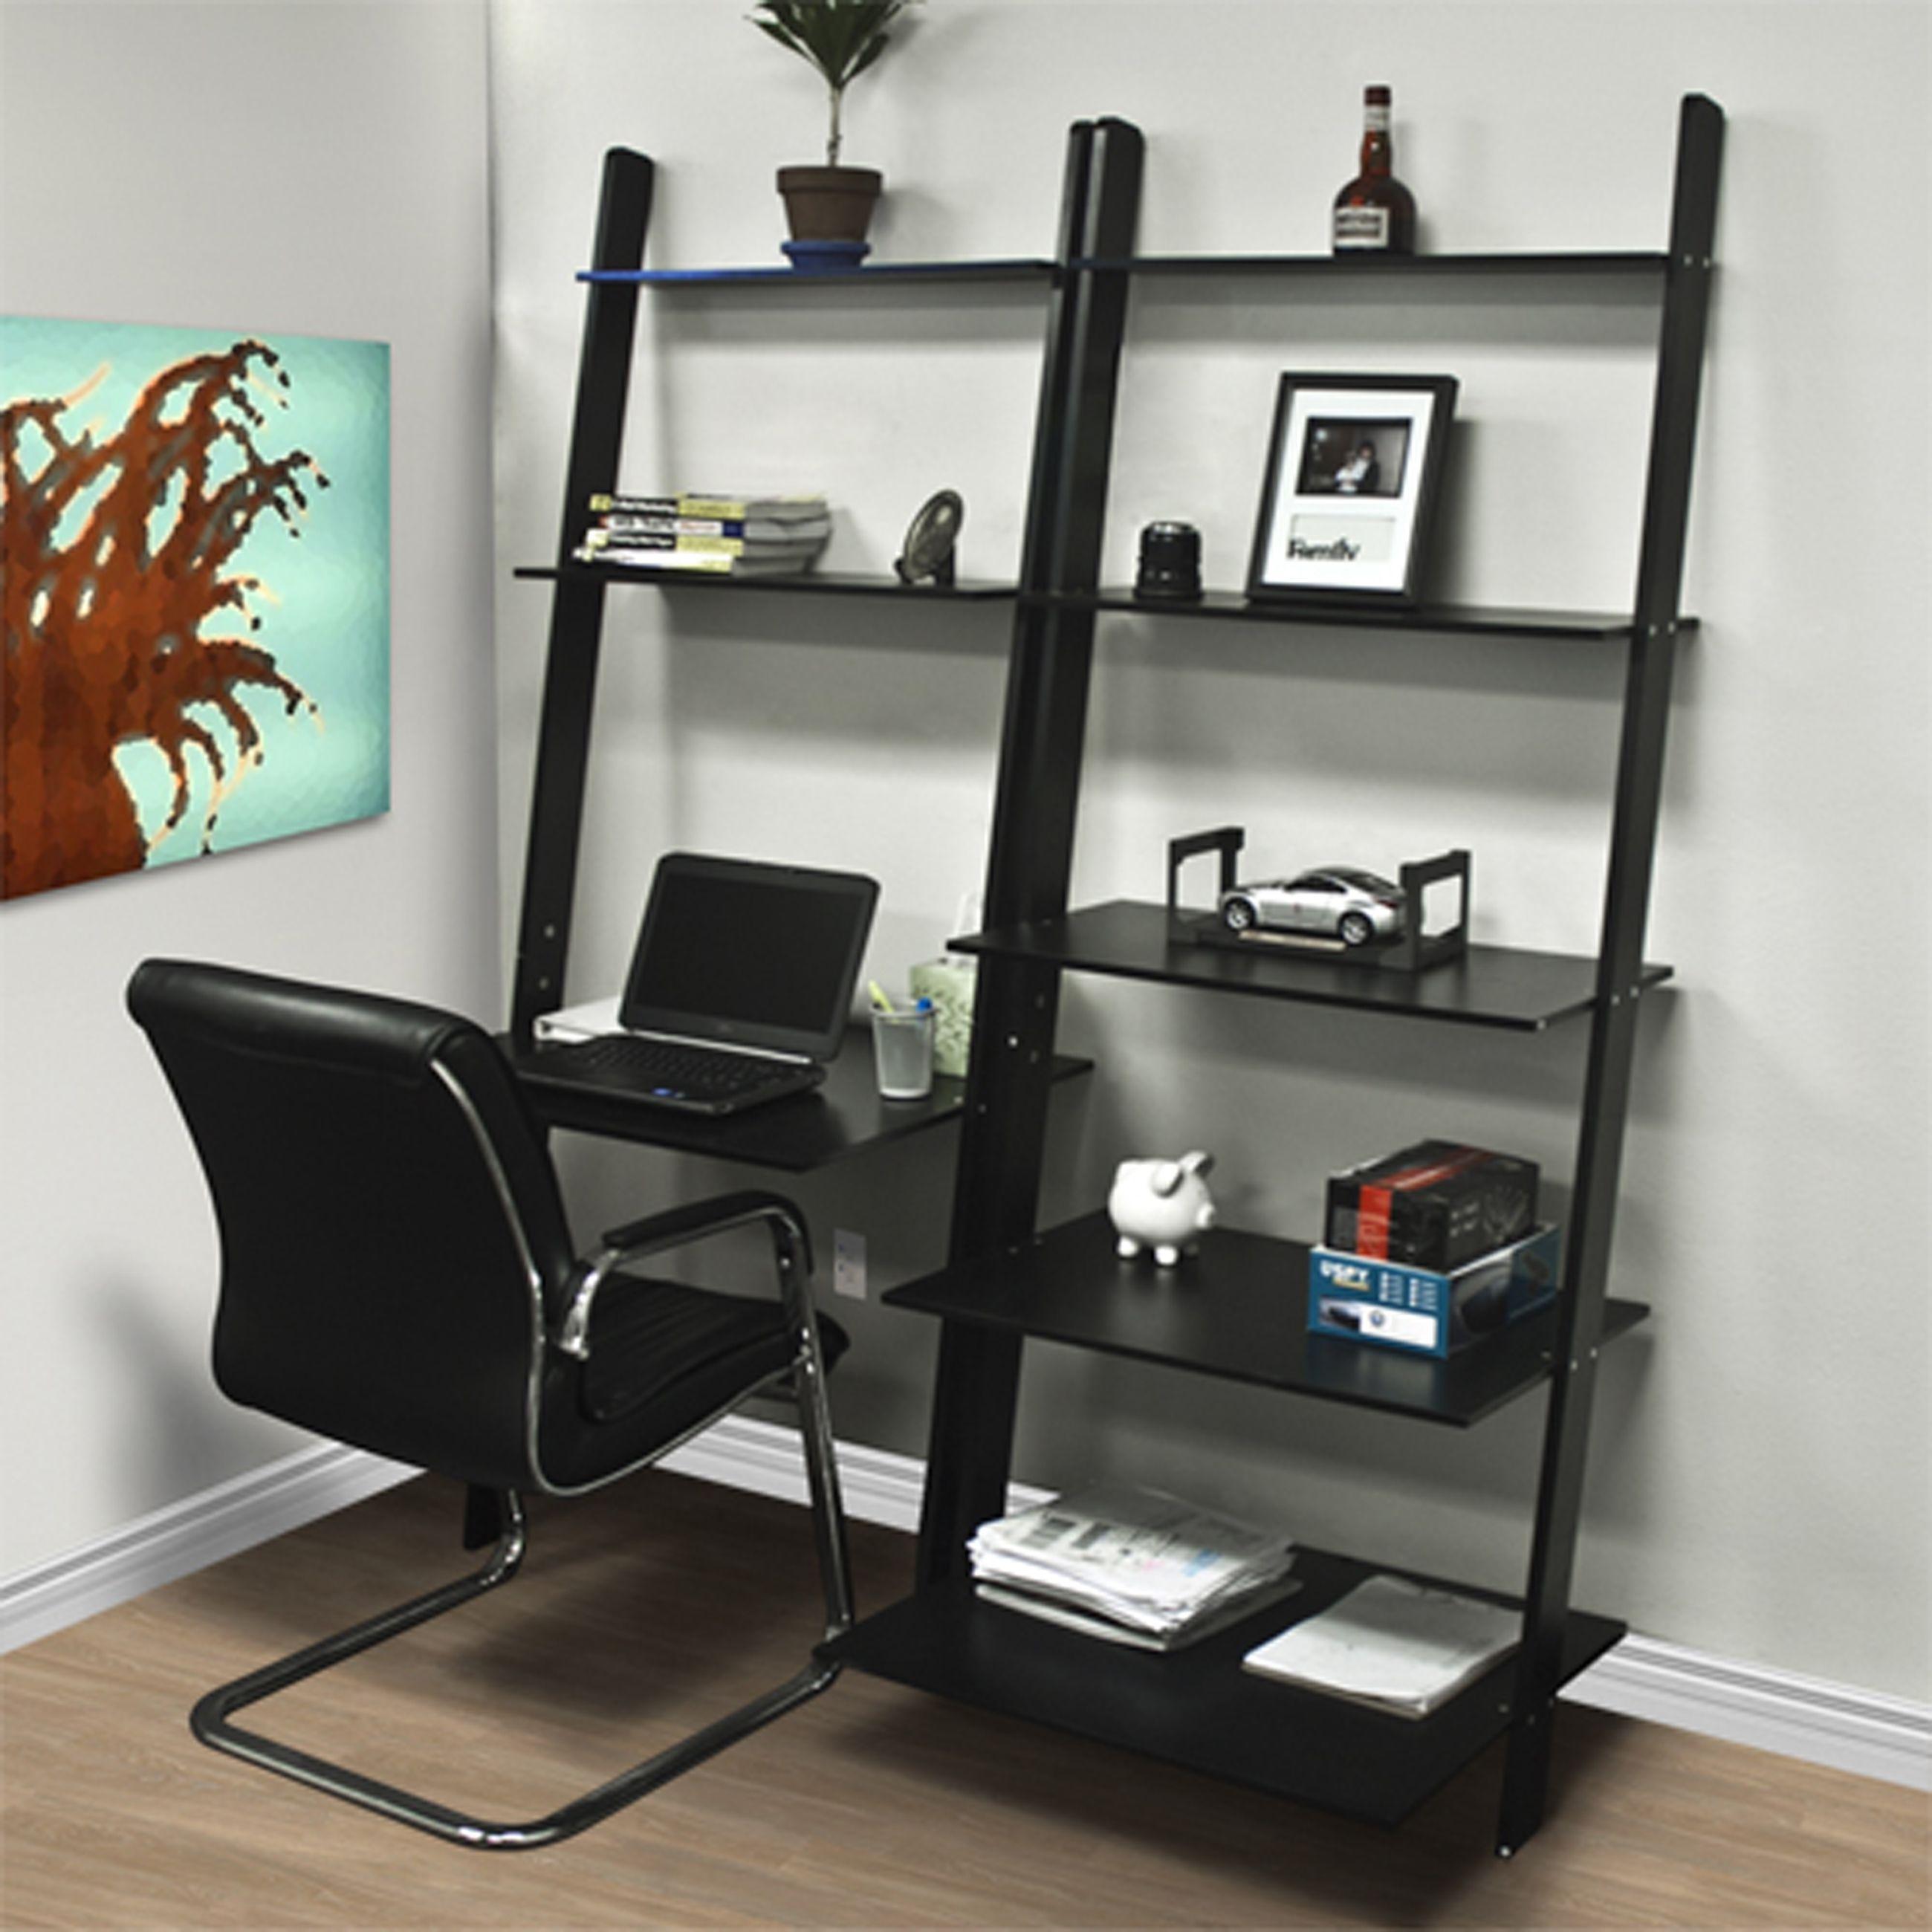 Impressive crate and barrel office desk elegant new crate and